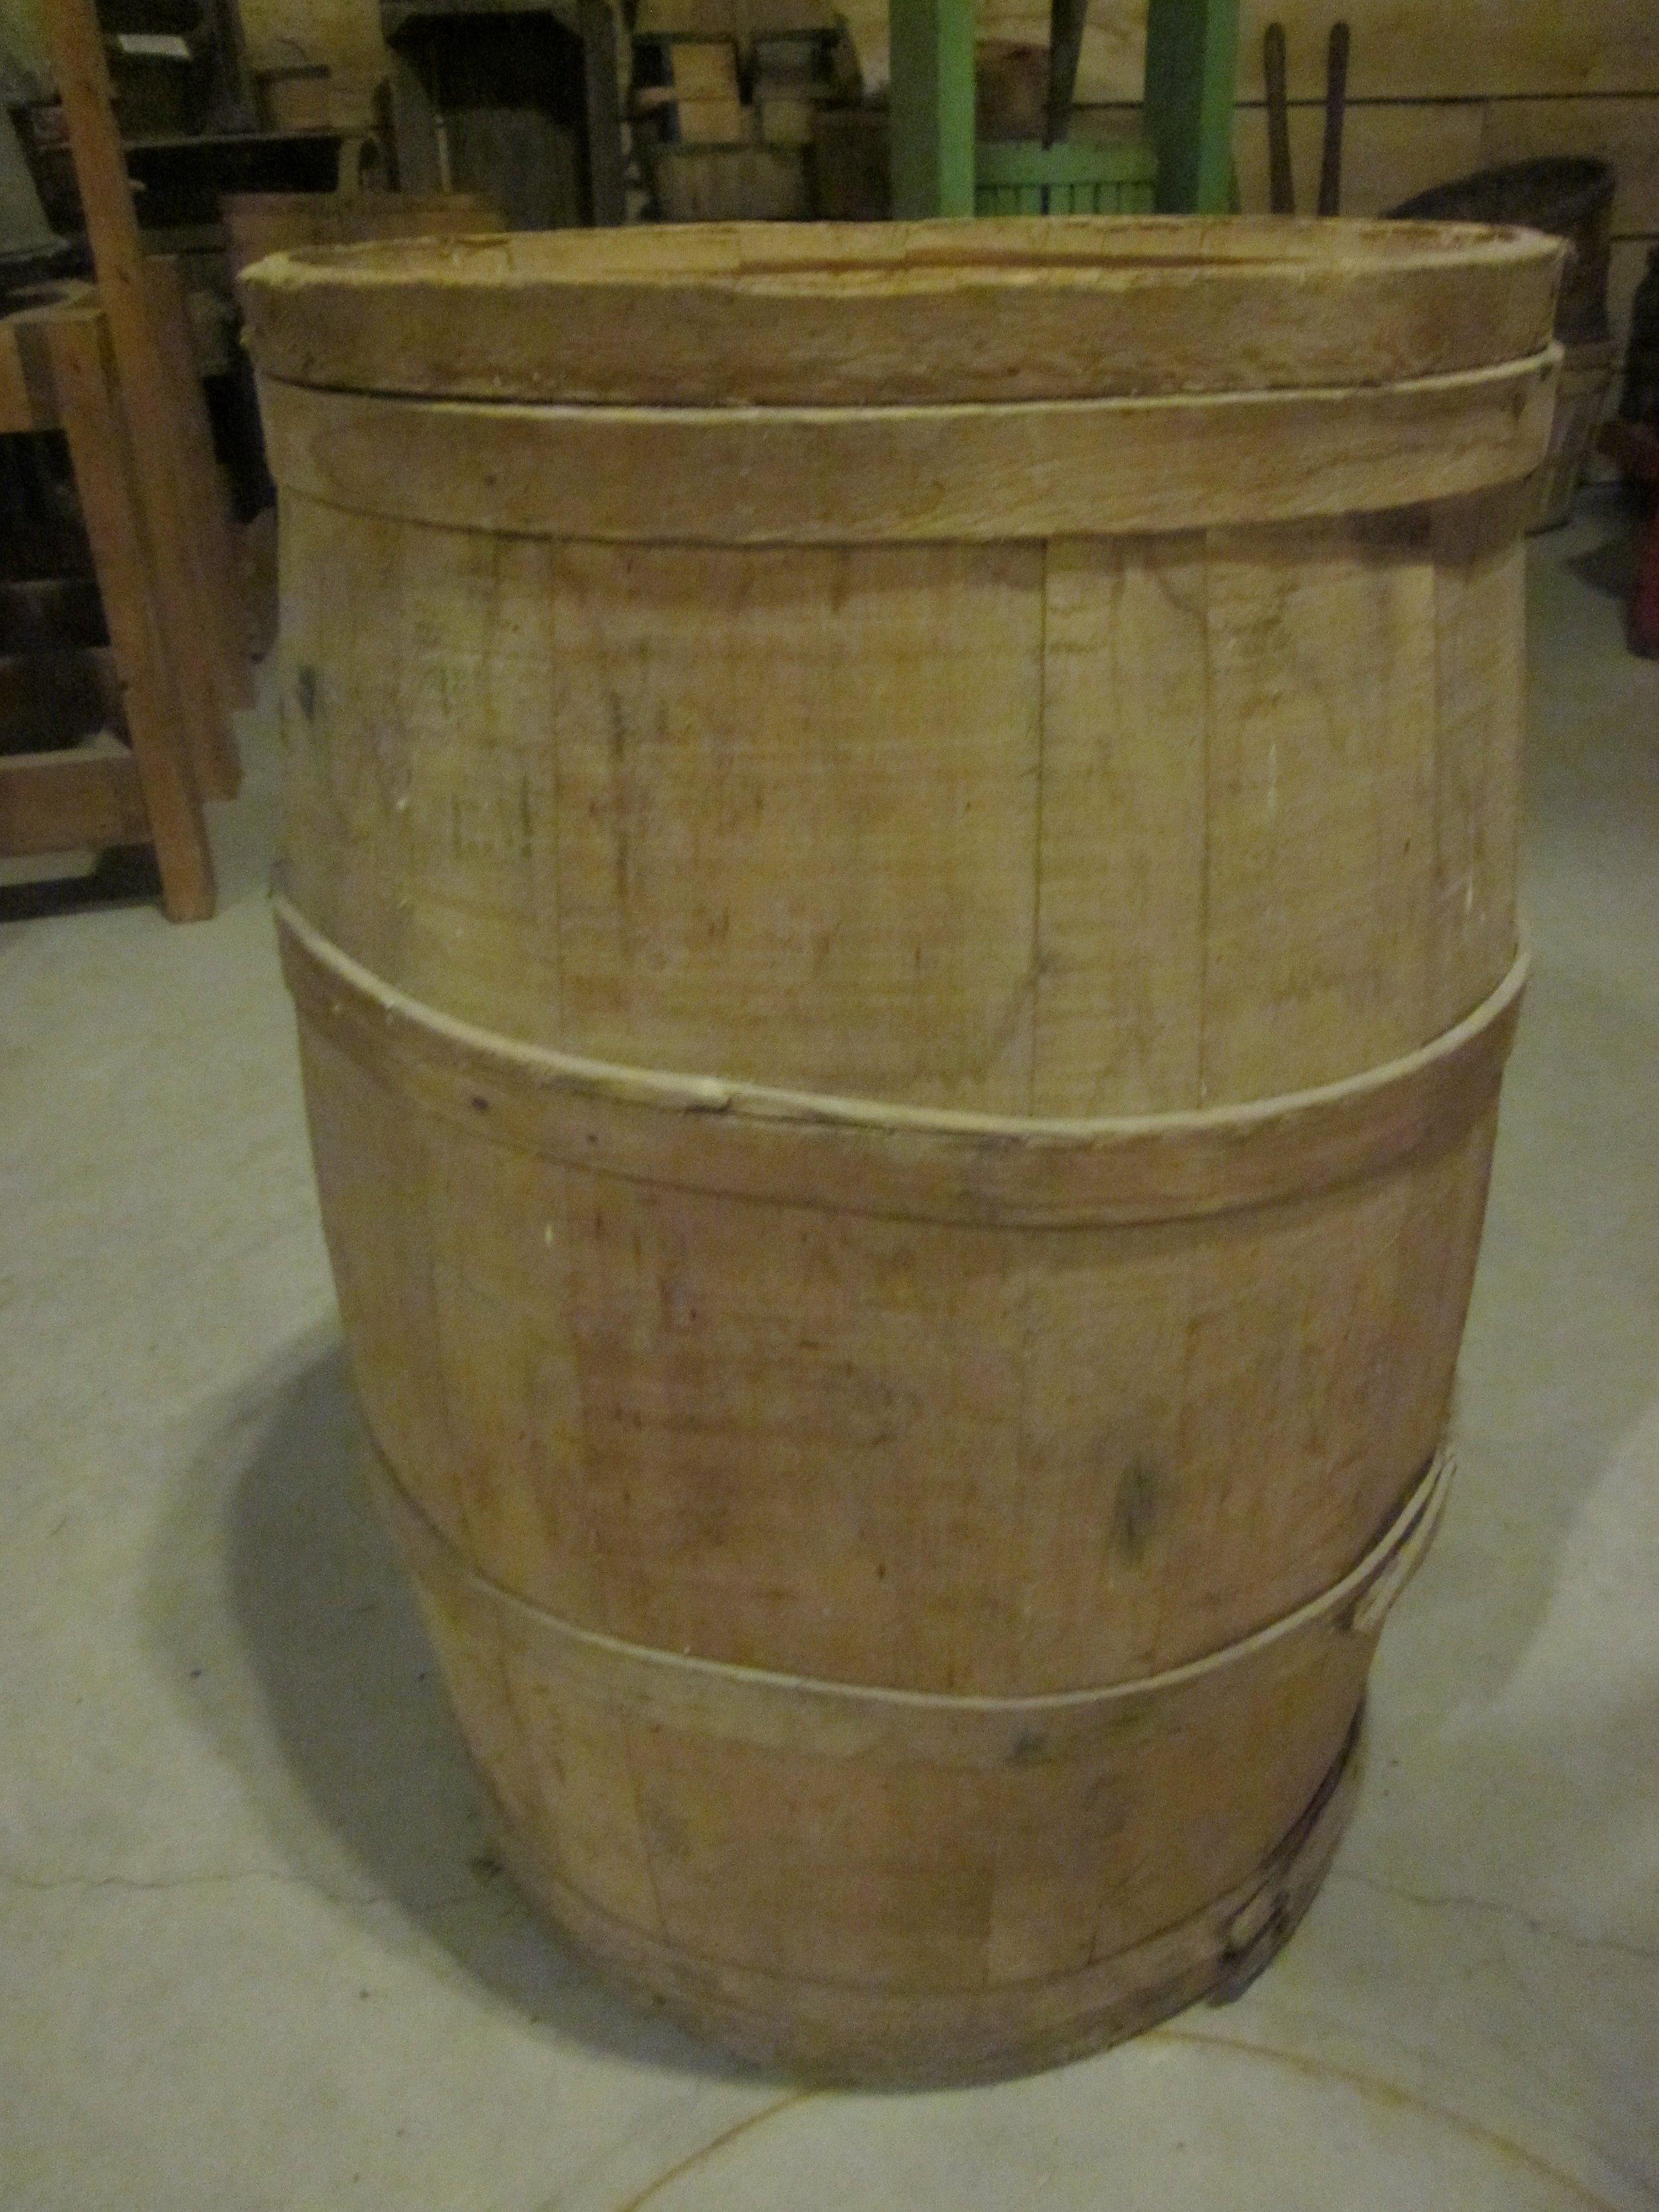 Apple storage barrel